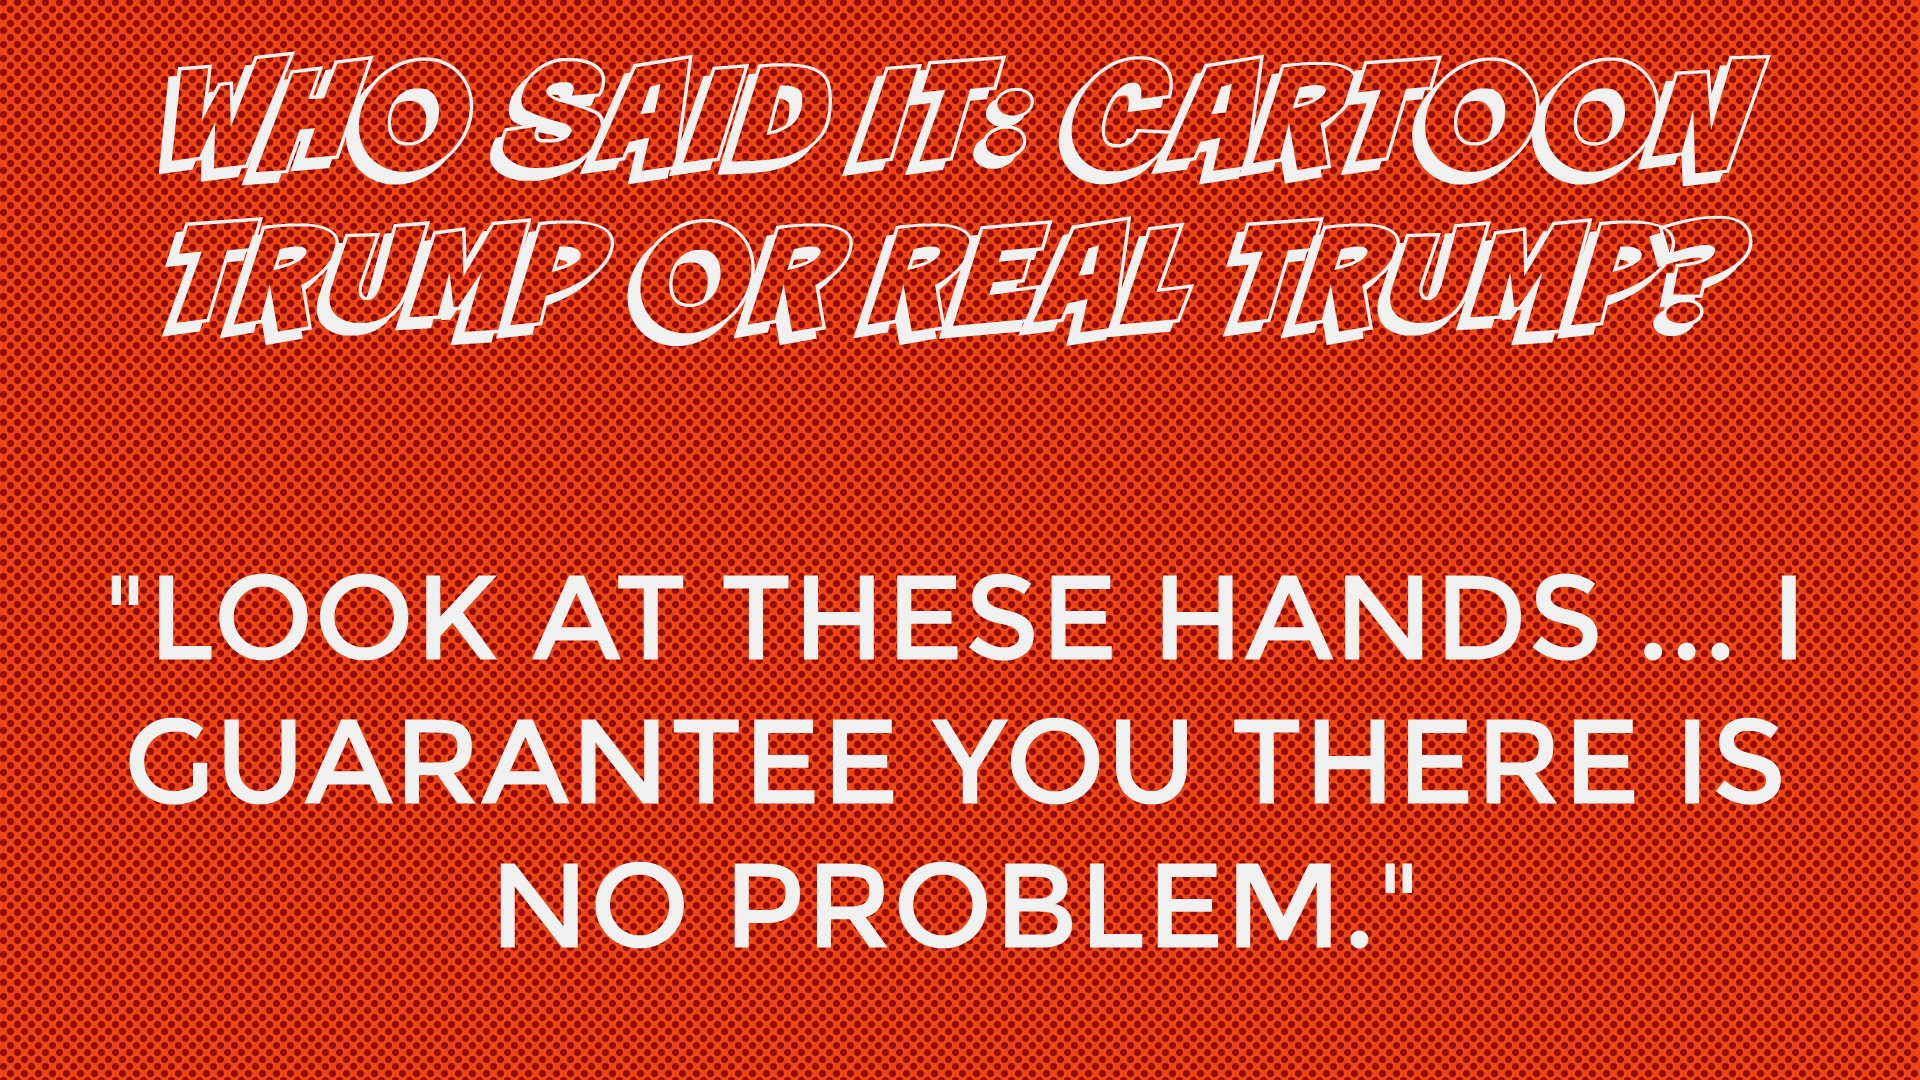 Who said it: Cartoon Trump or Real Trump?